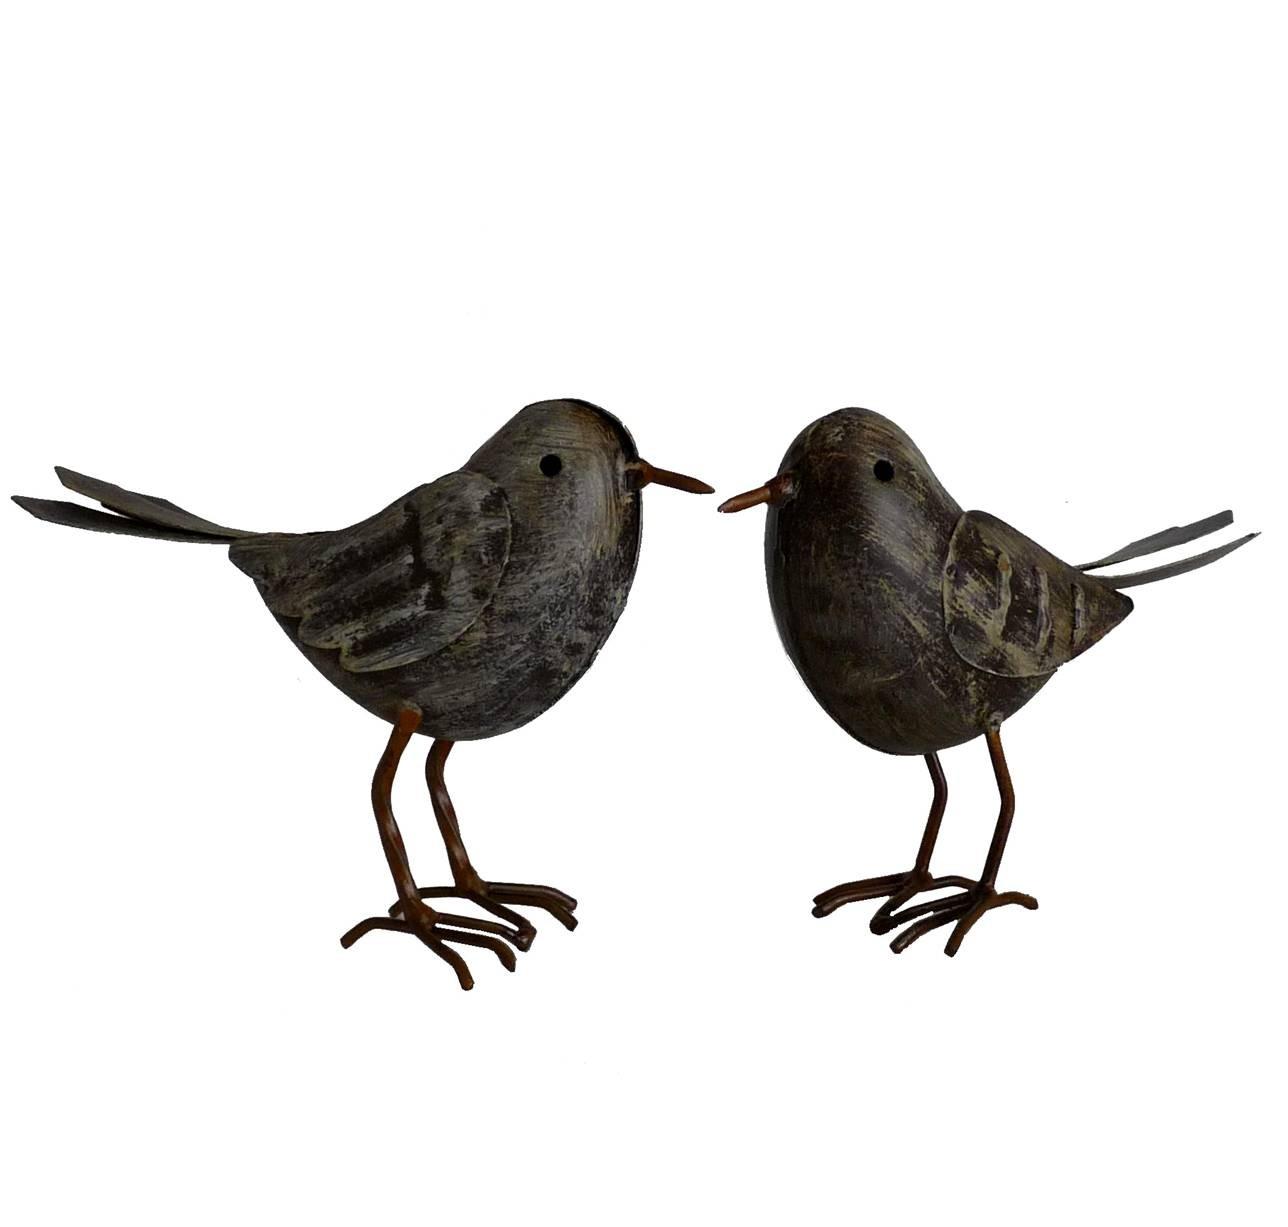 Oiseau en fer pour jardin fashion designs for Oiseau decoratif jardin